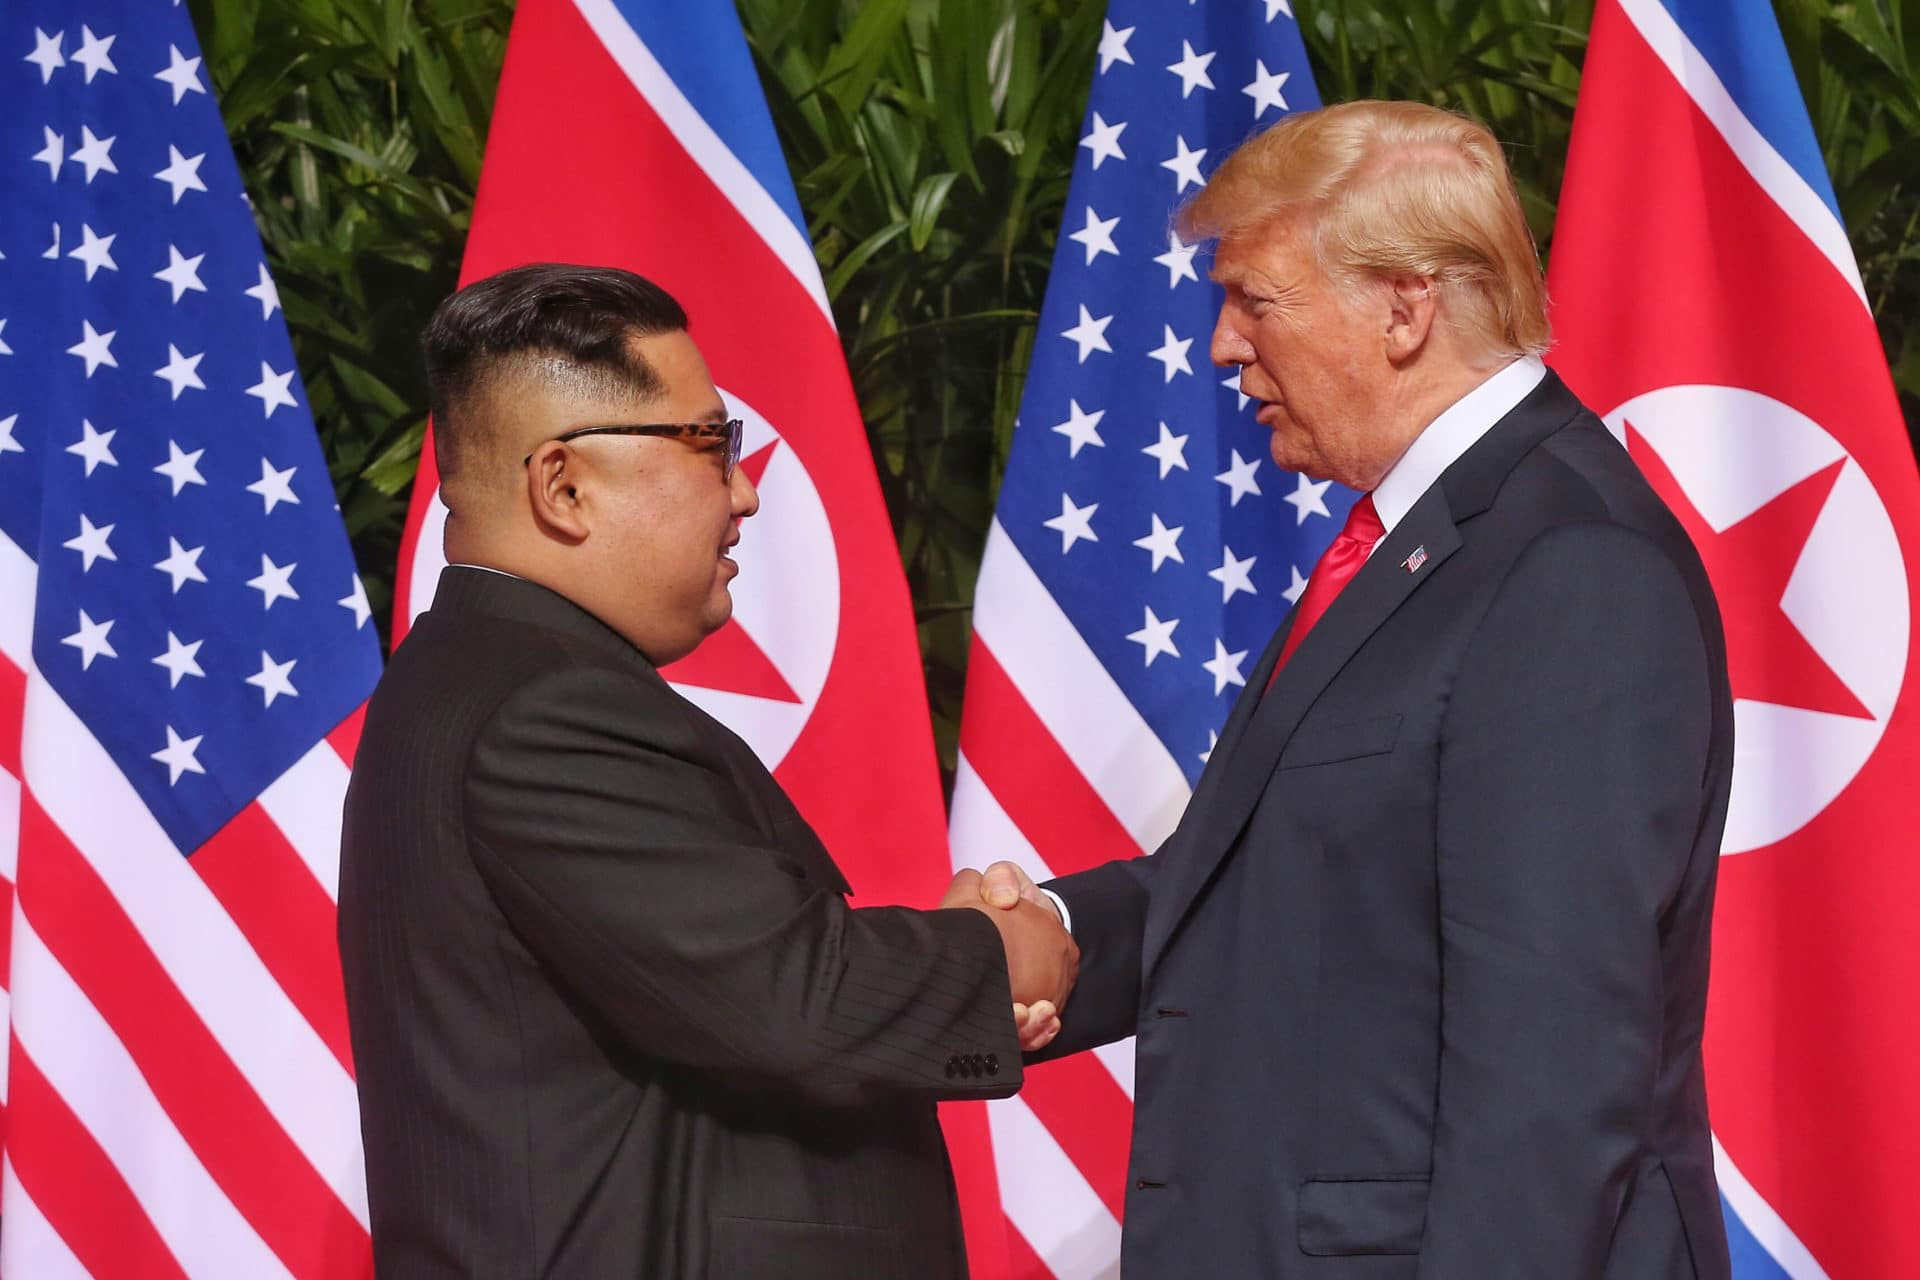 Donald Trump handshakes